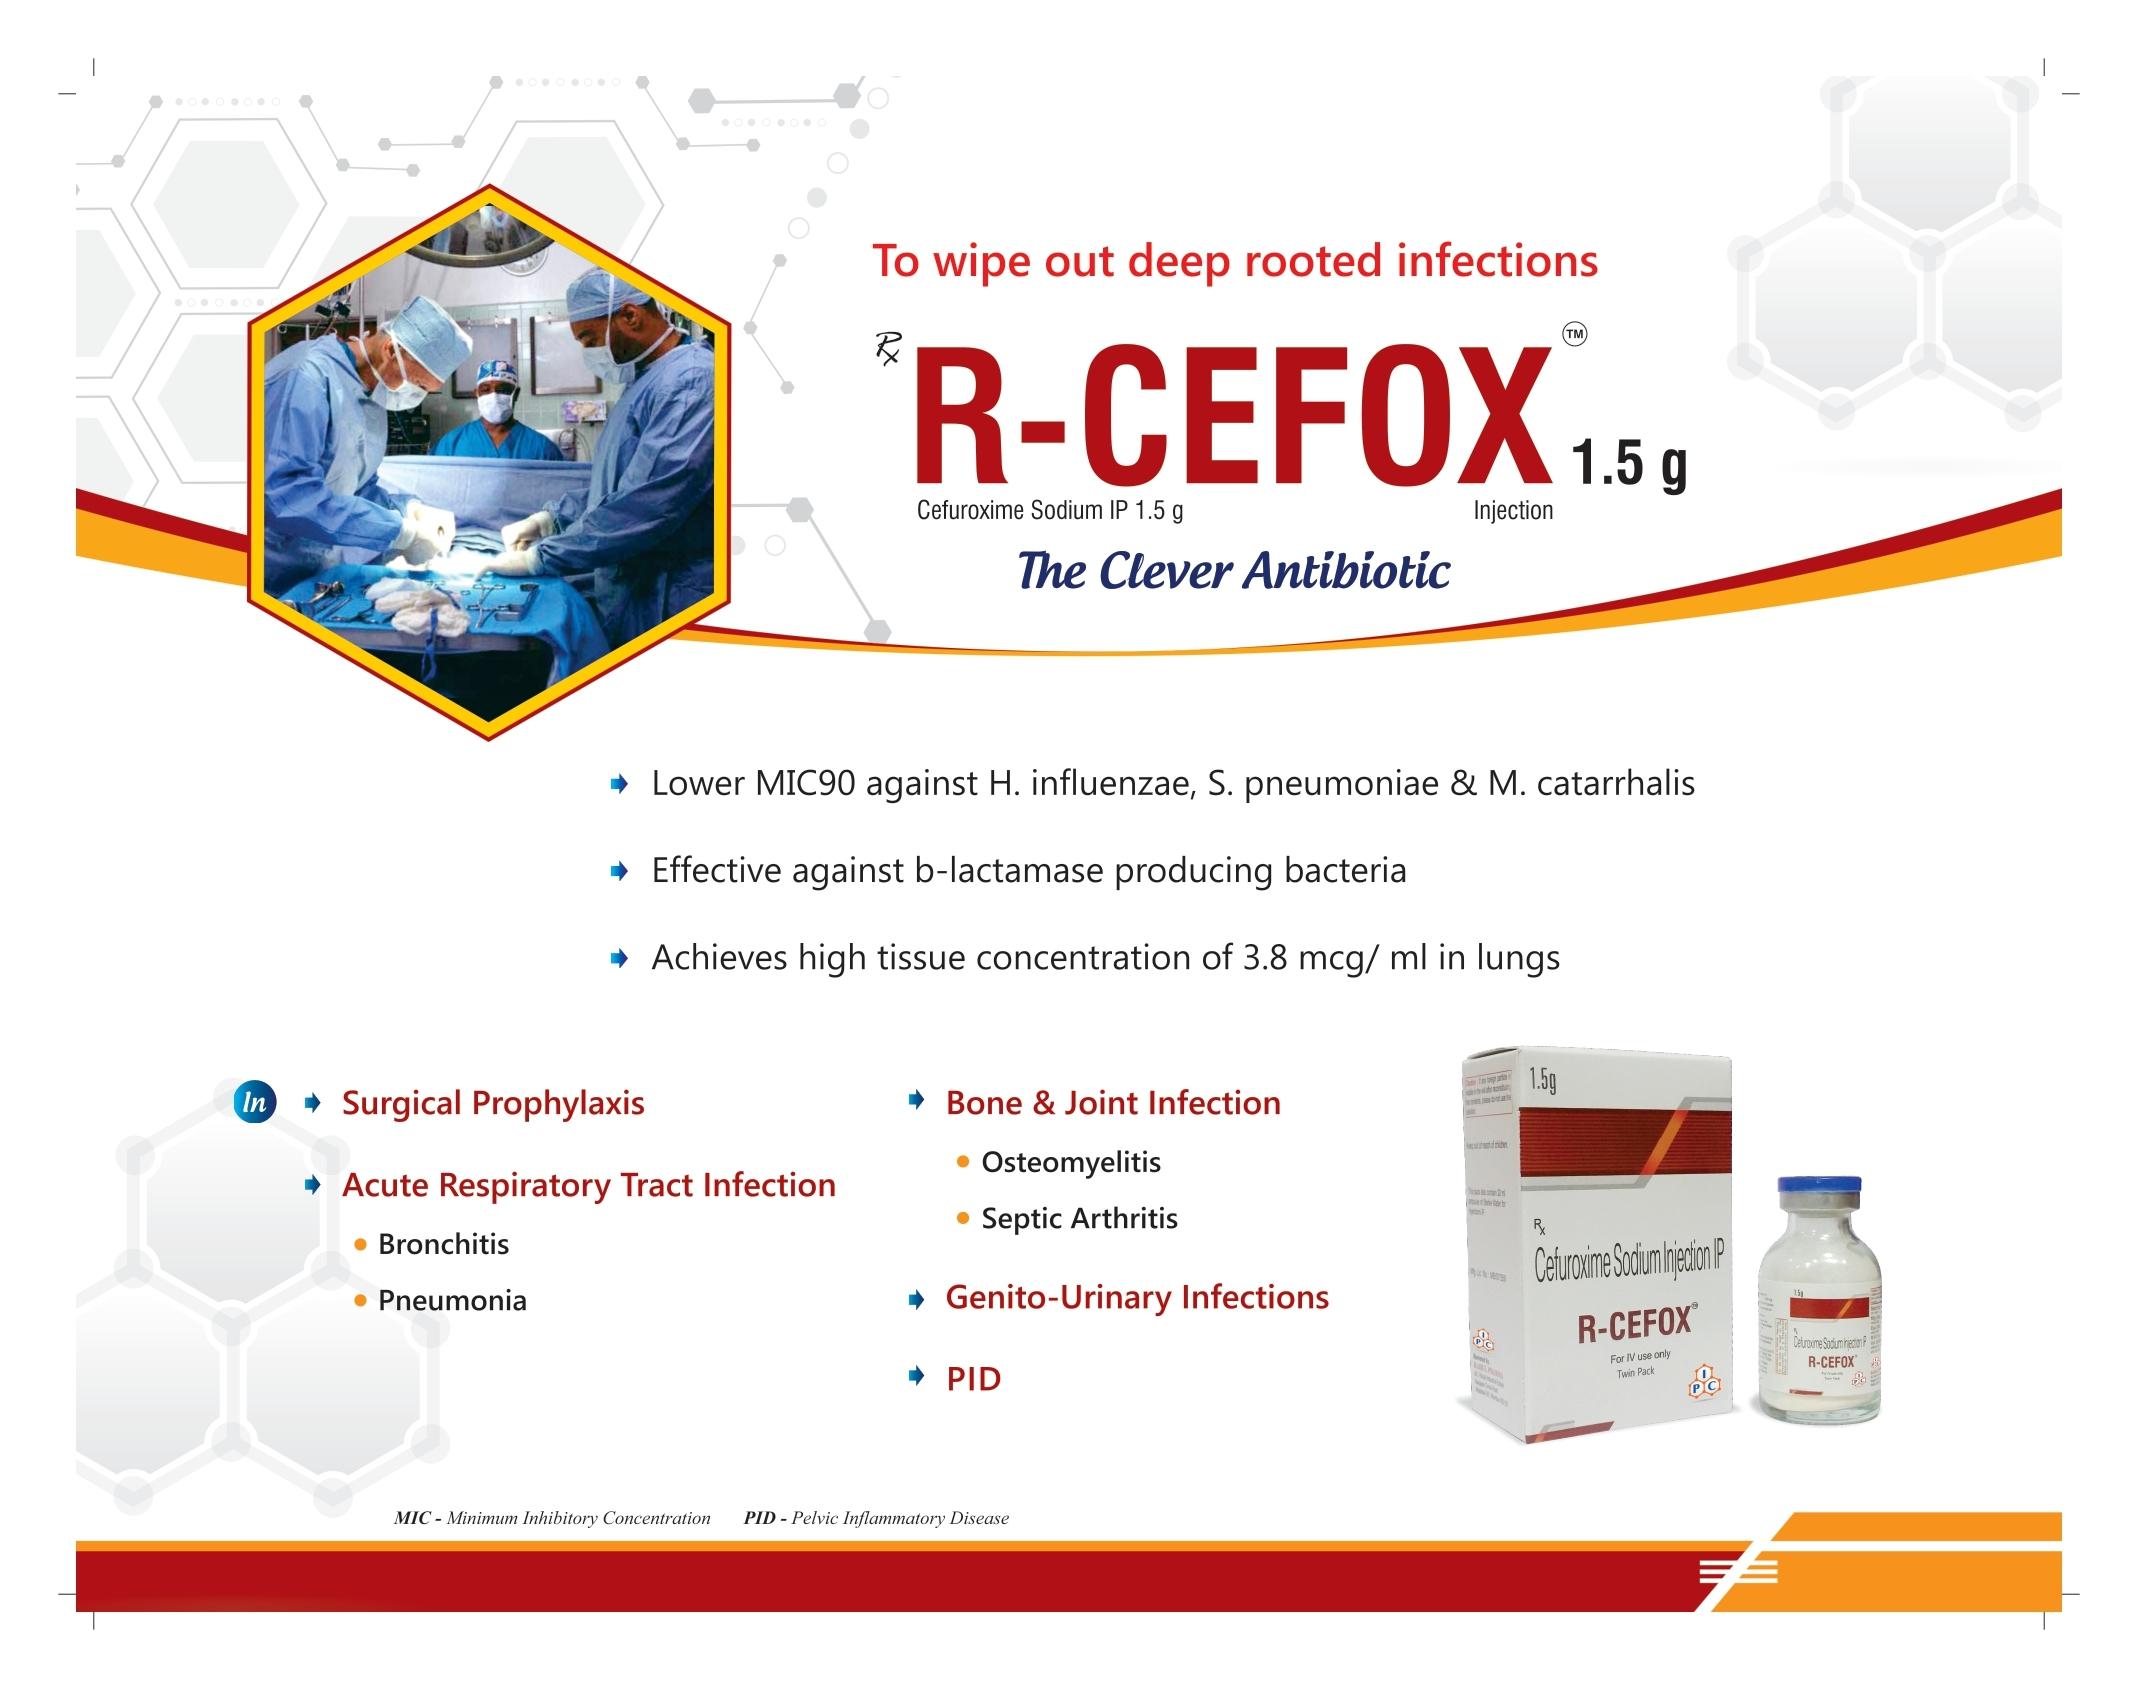 R-Cefox 1.5G Injection